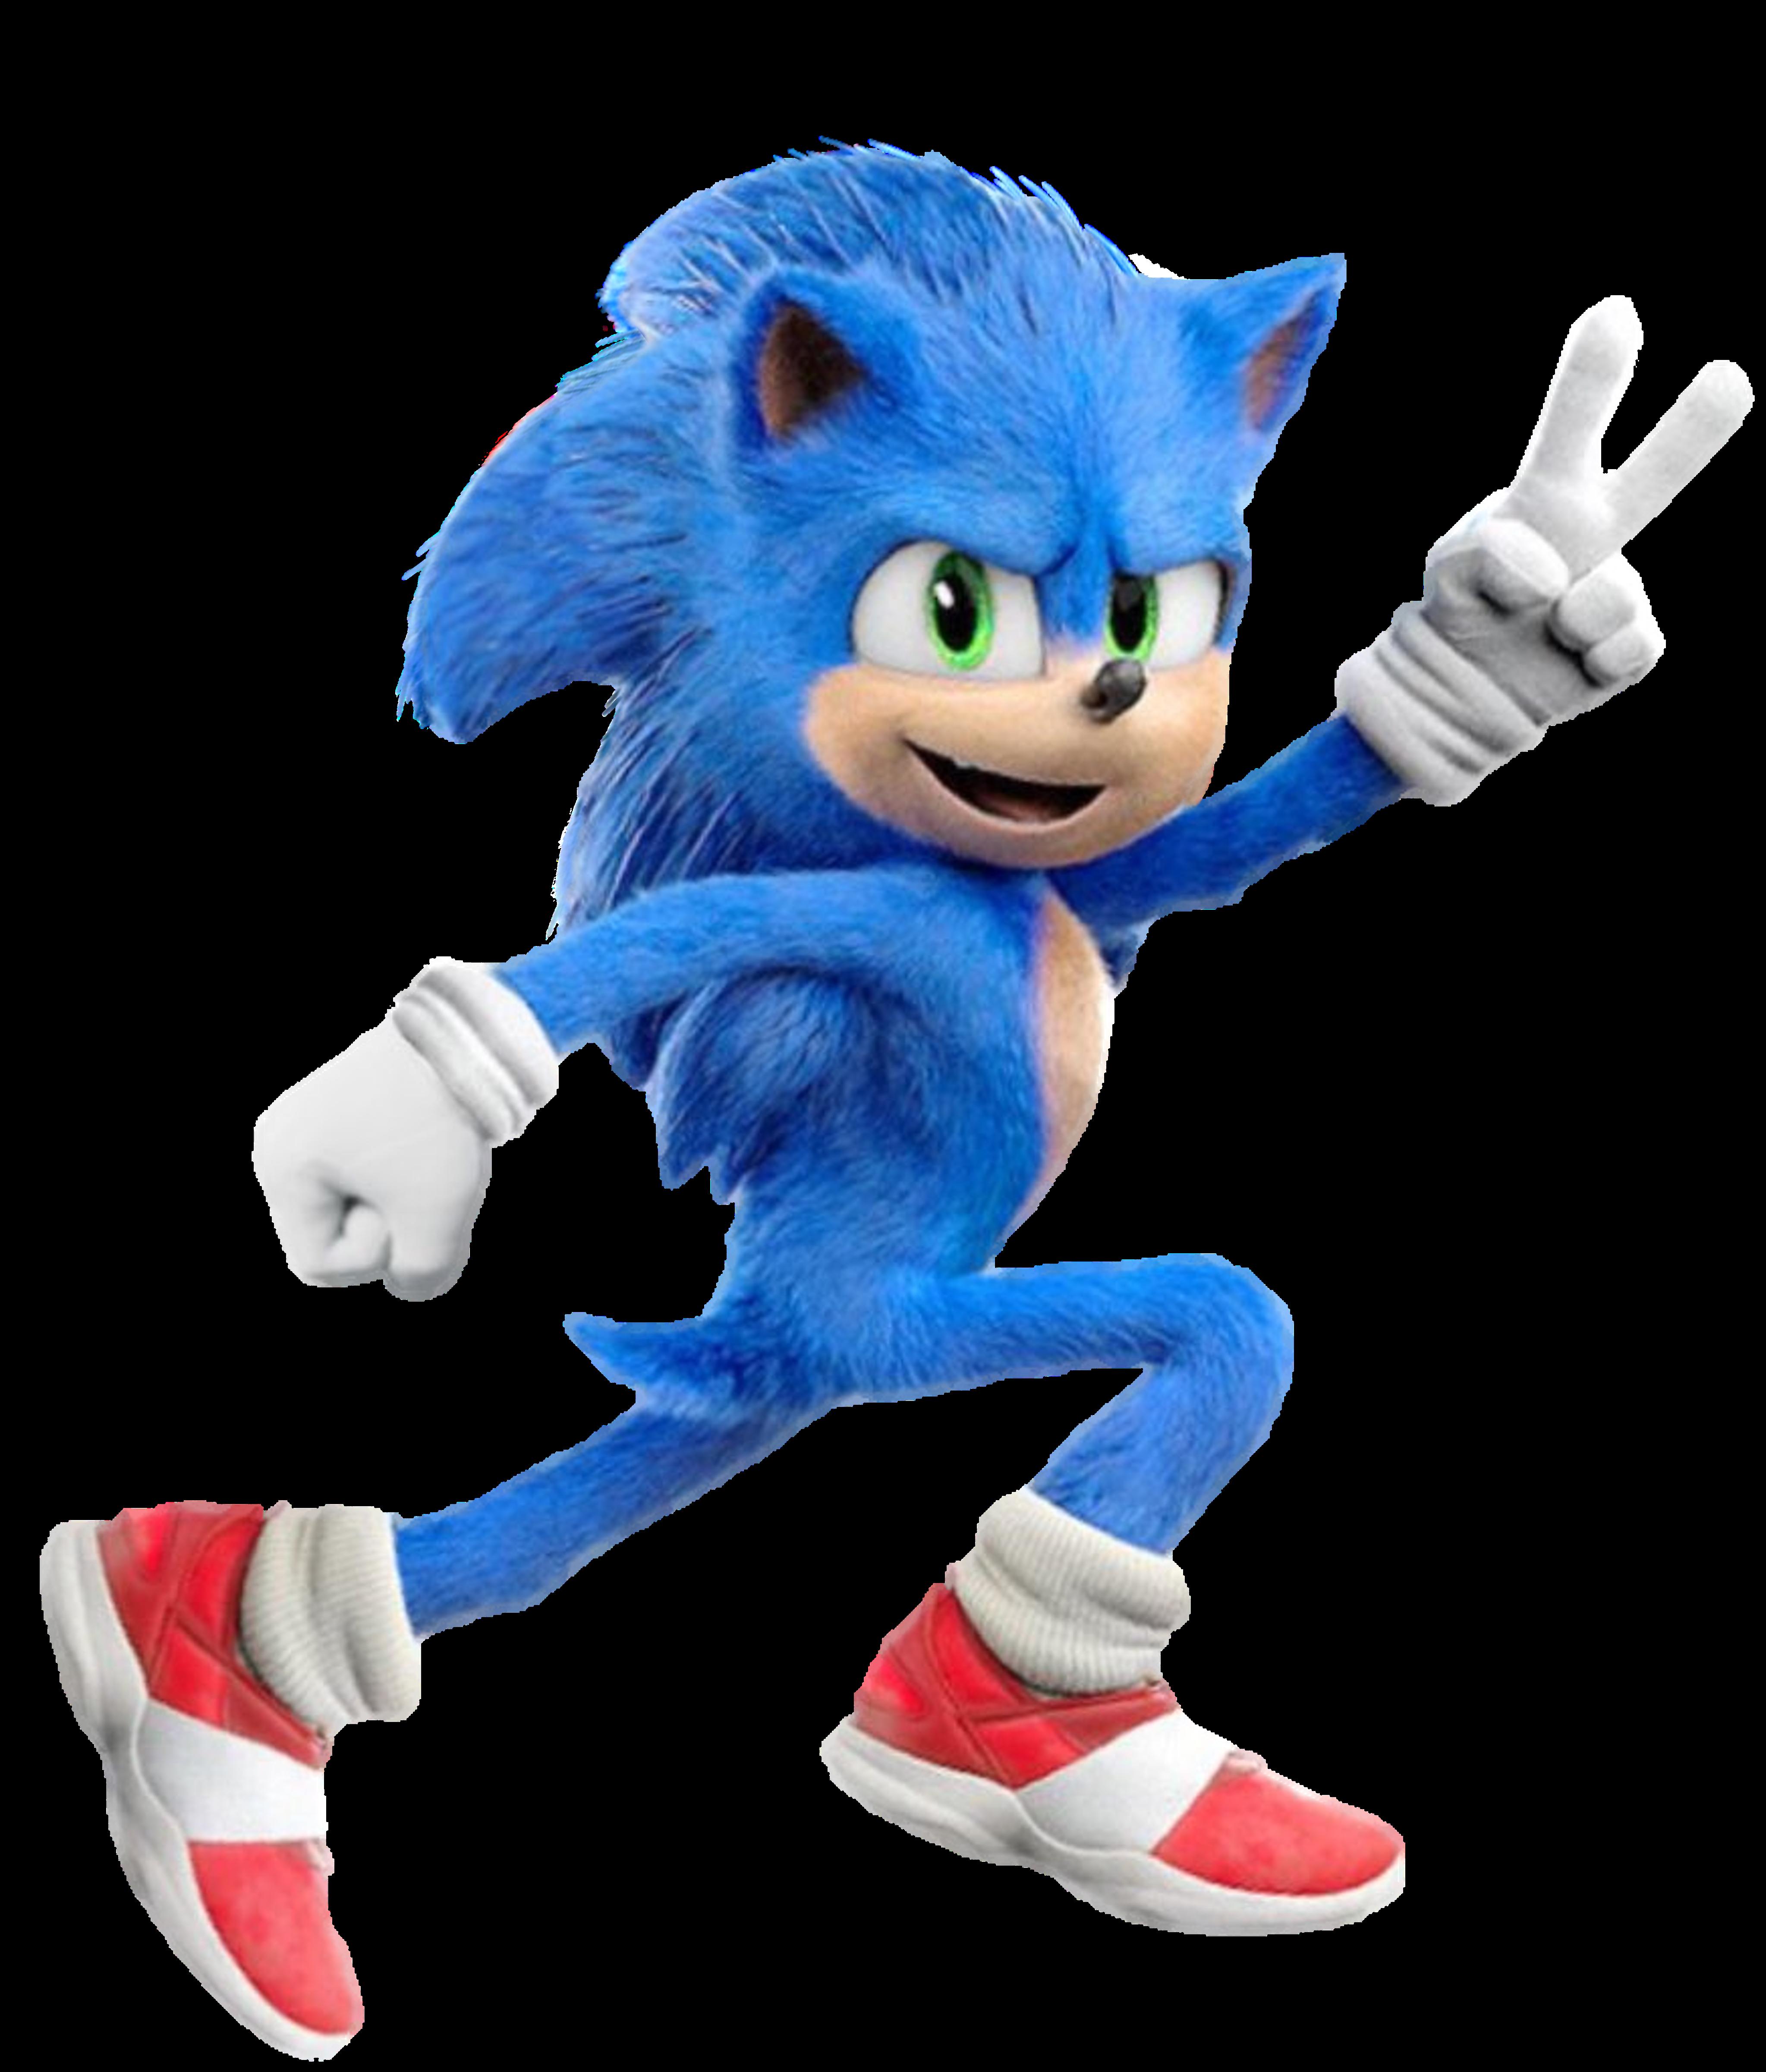 Sonic The Hedgehog 2020 Png By Vit0zai On Deviantart